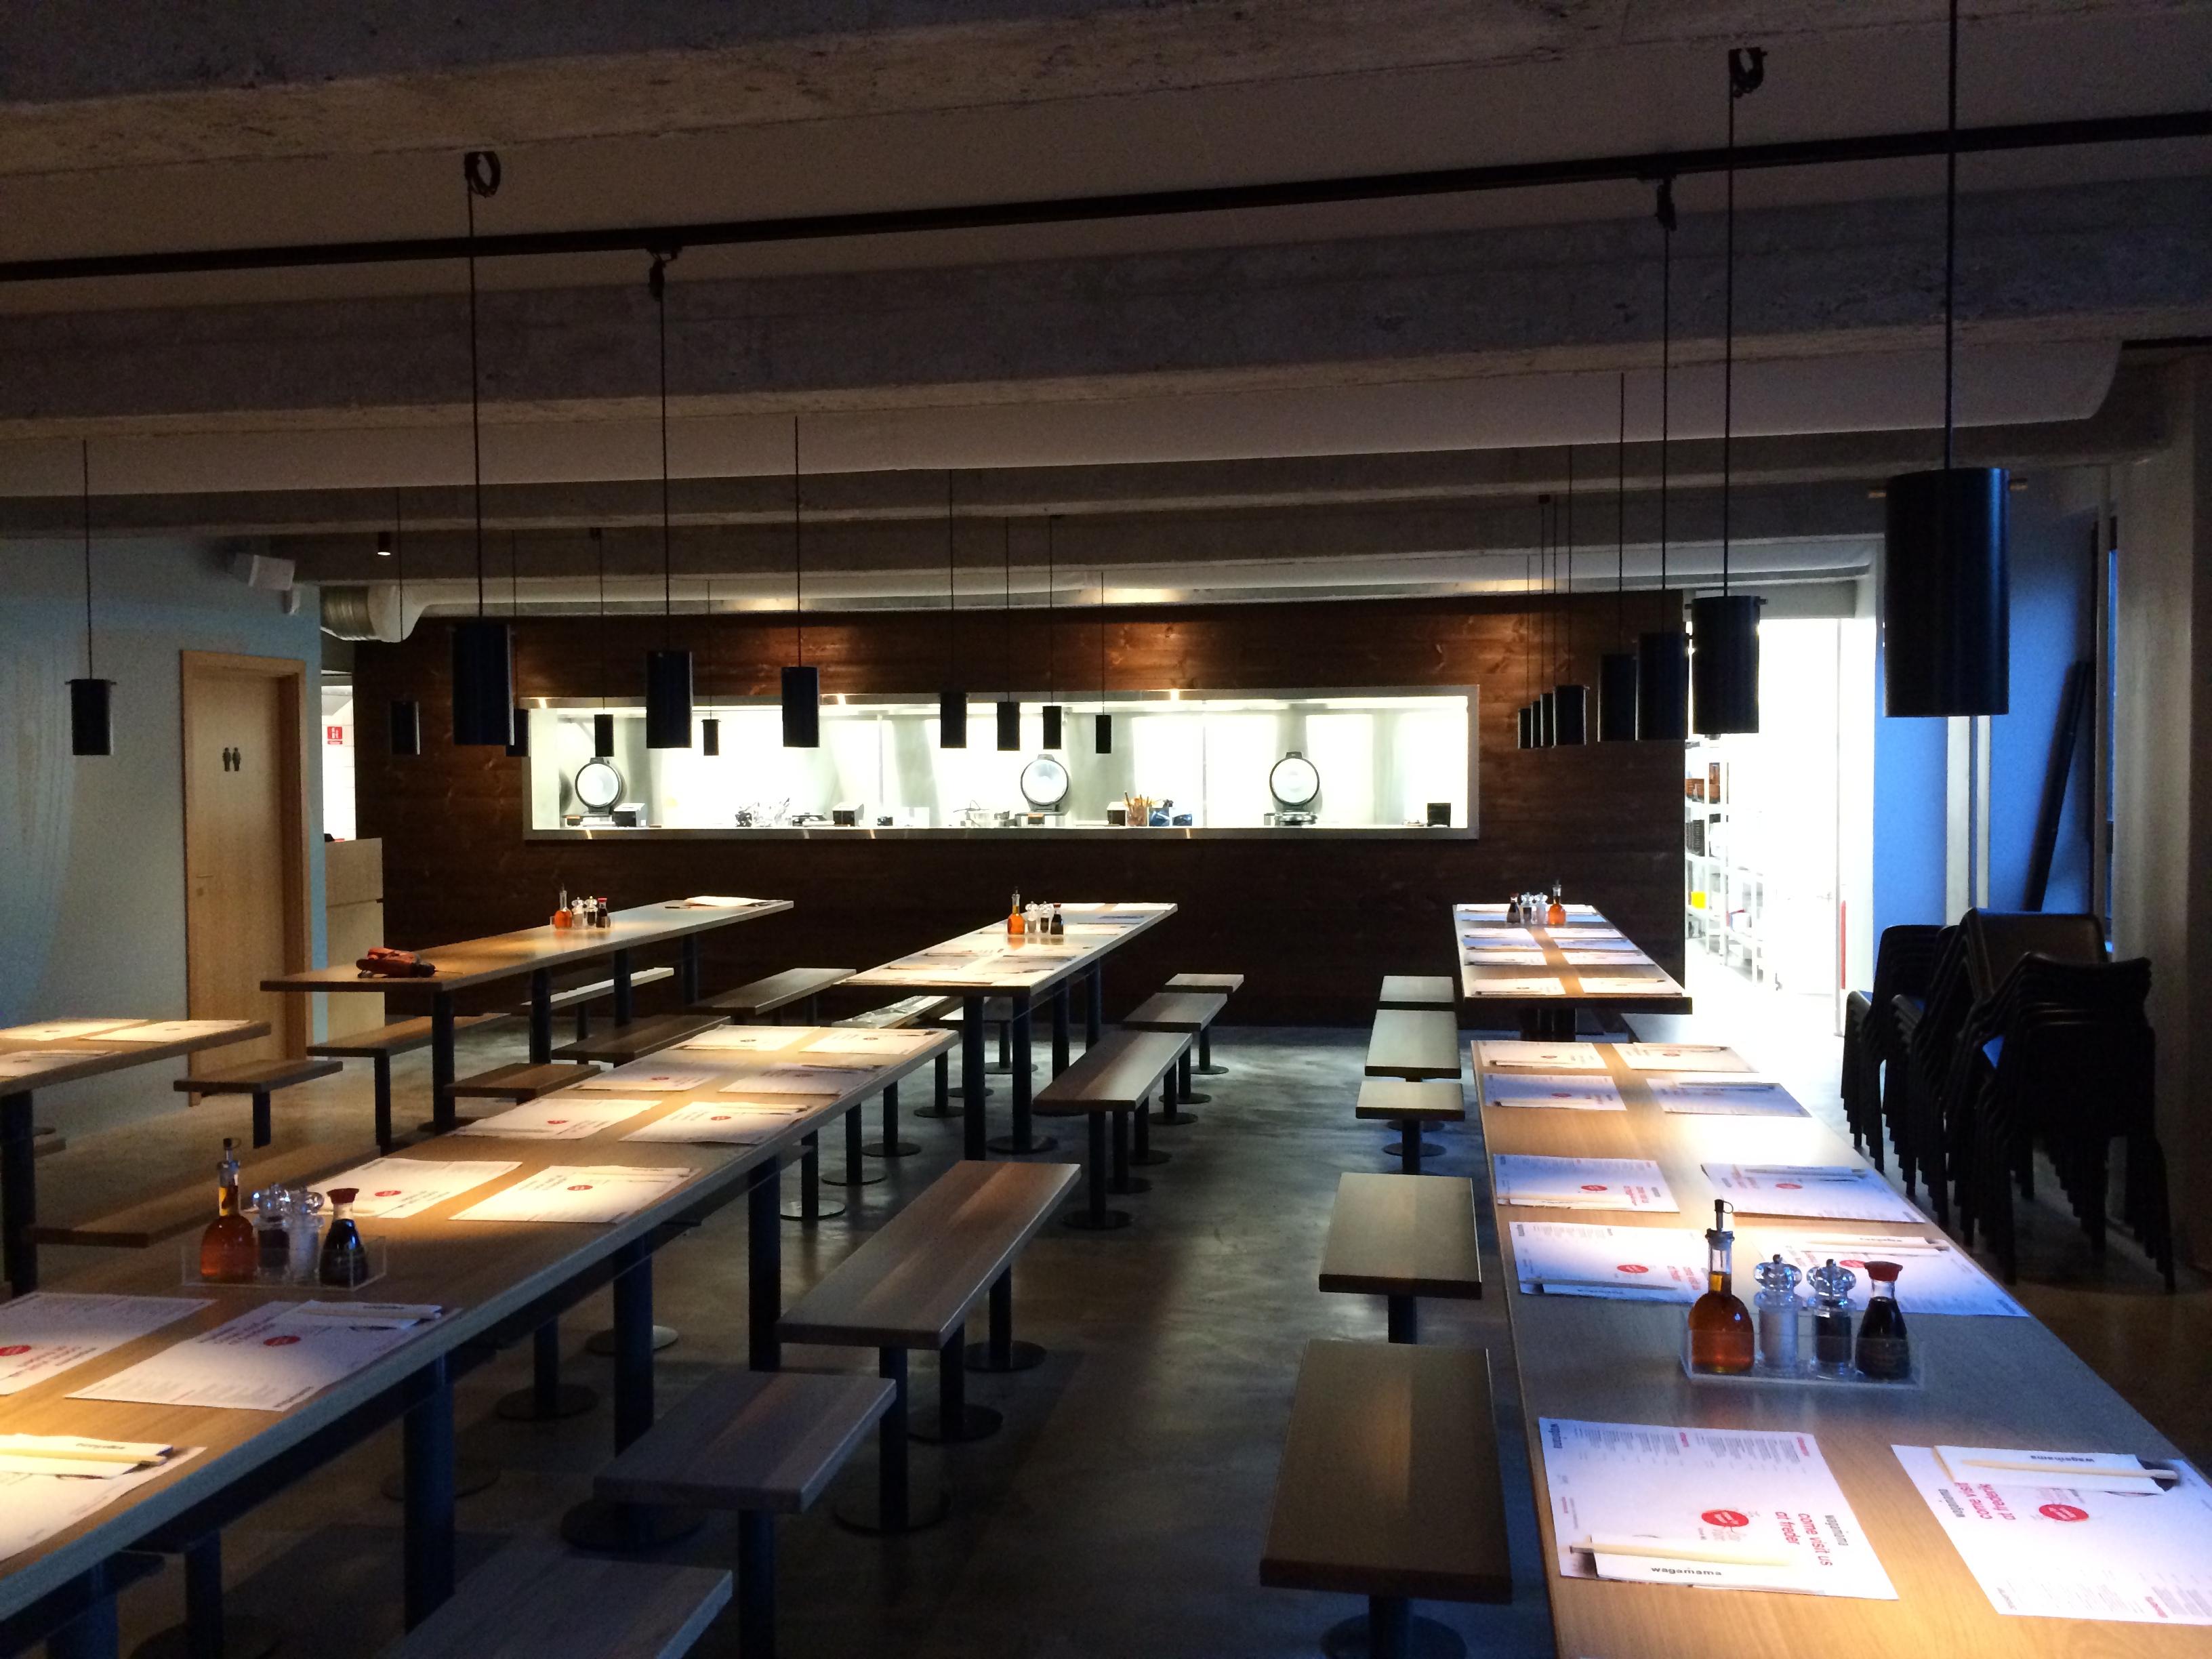 Renovering - ny restaurant Wagamama på Frederiksberg